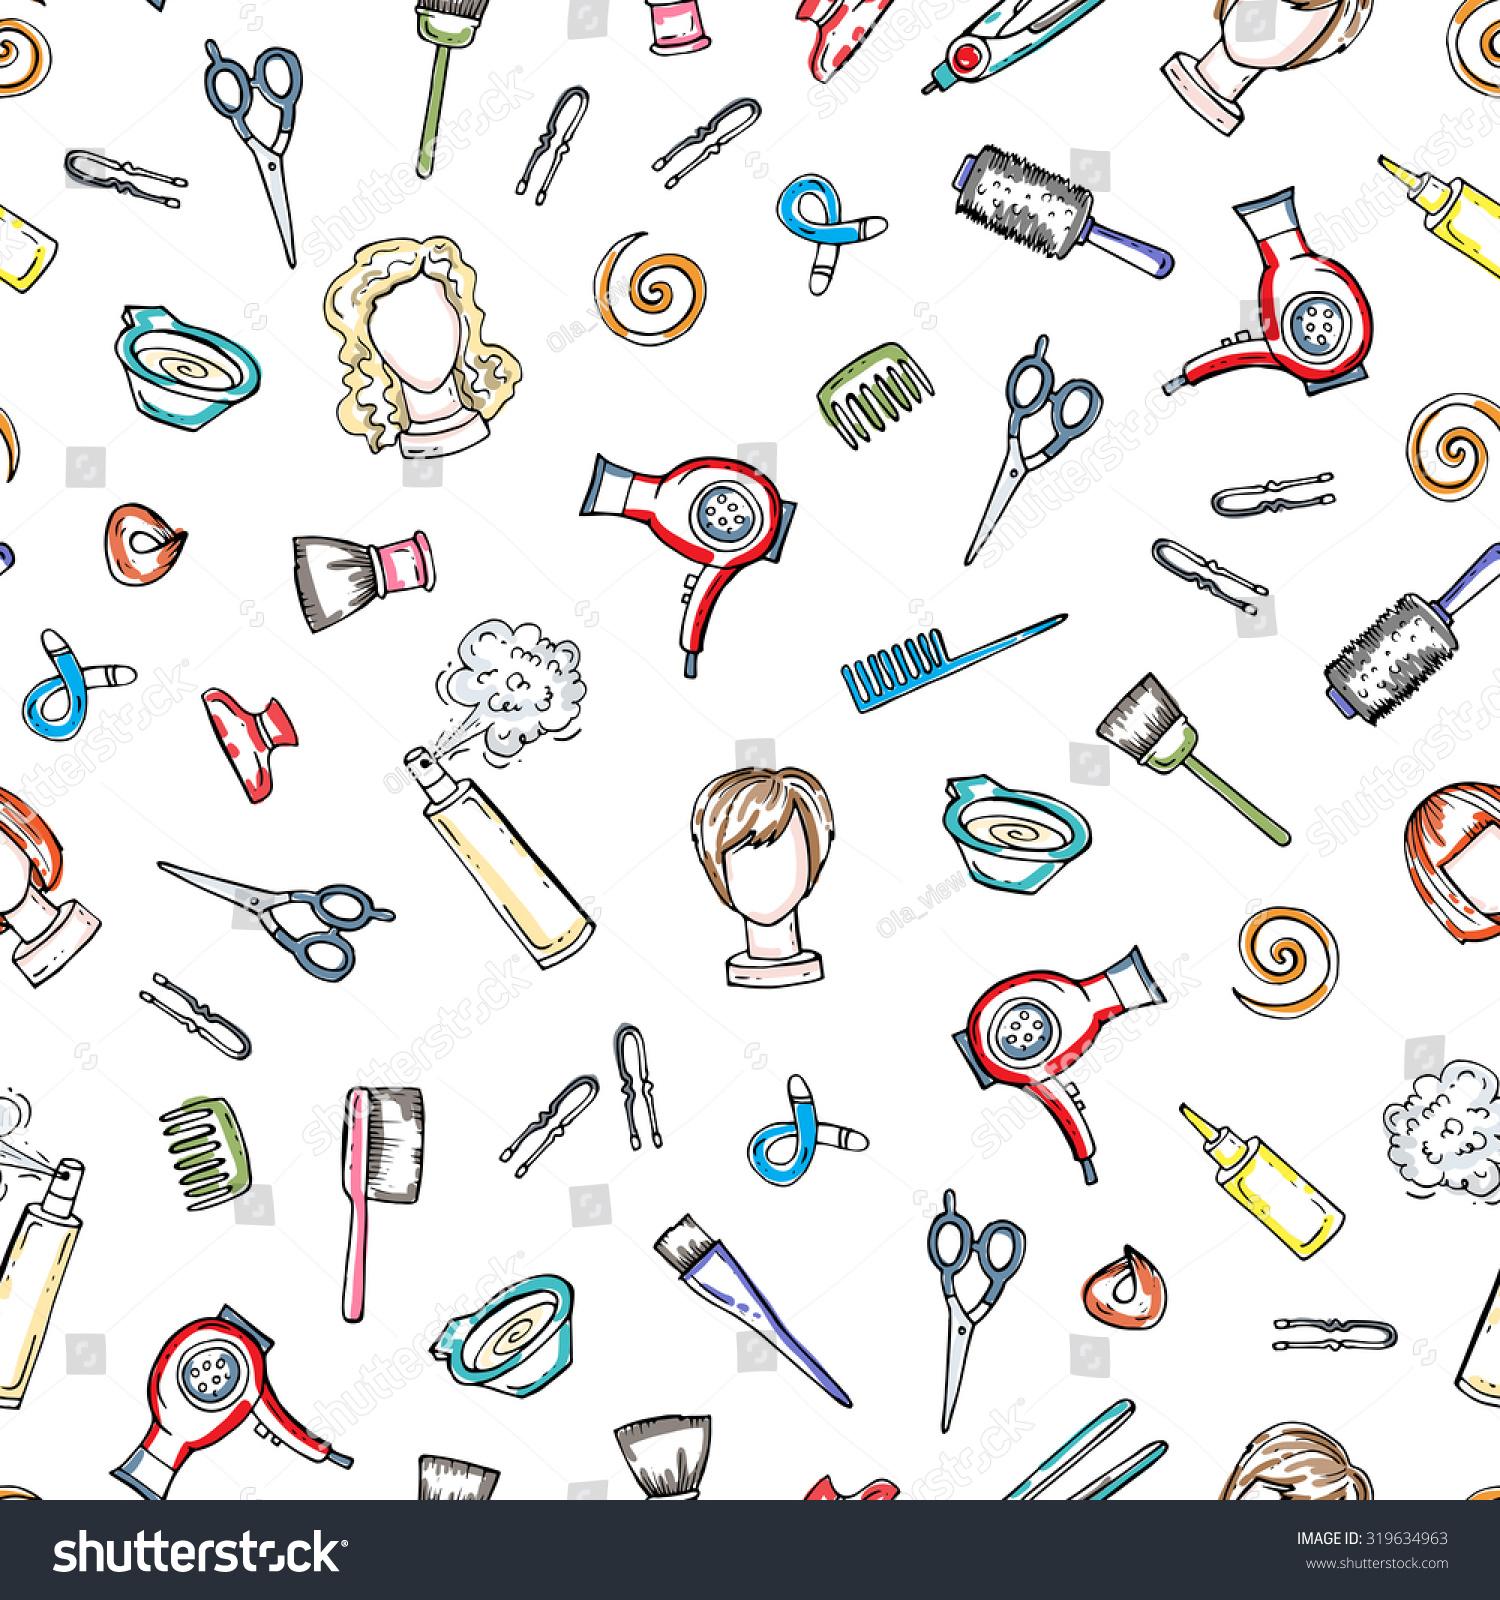 hair scissors wallpaper - photo #17